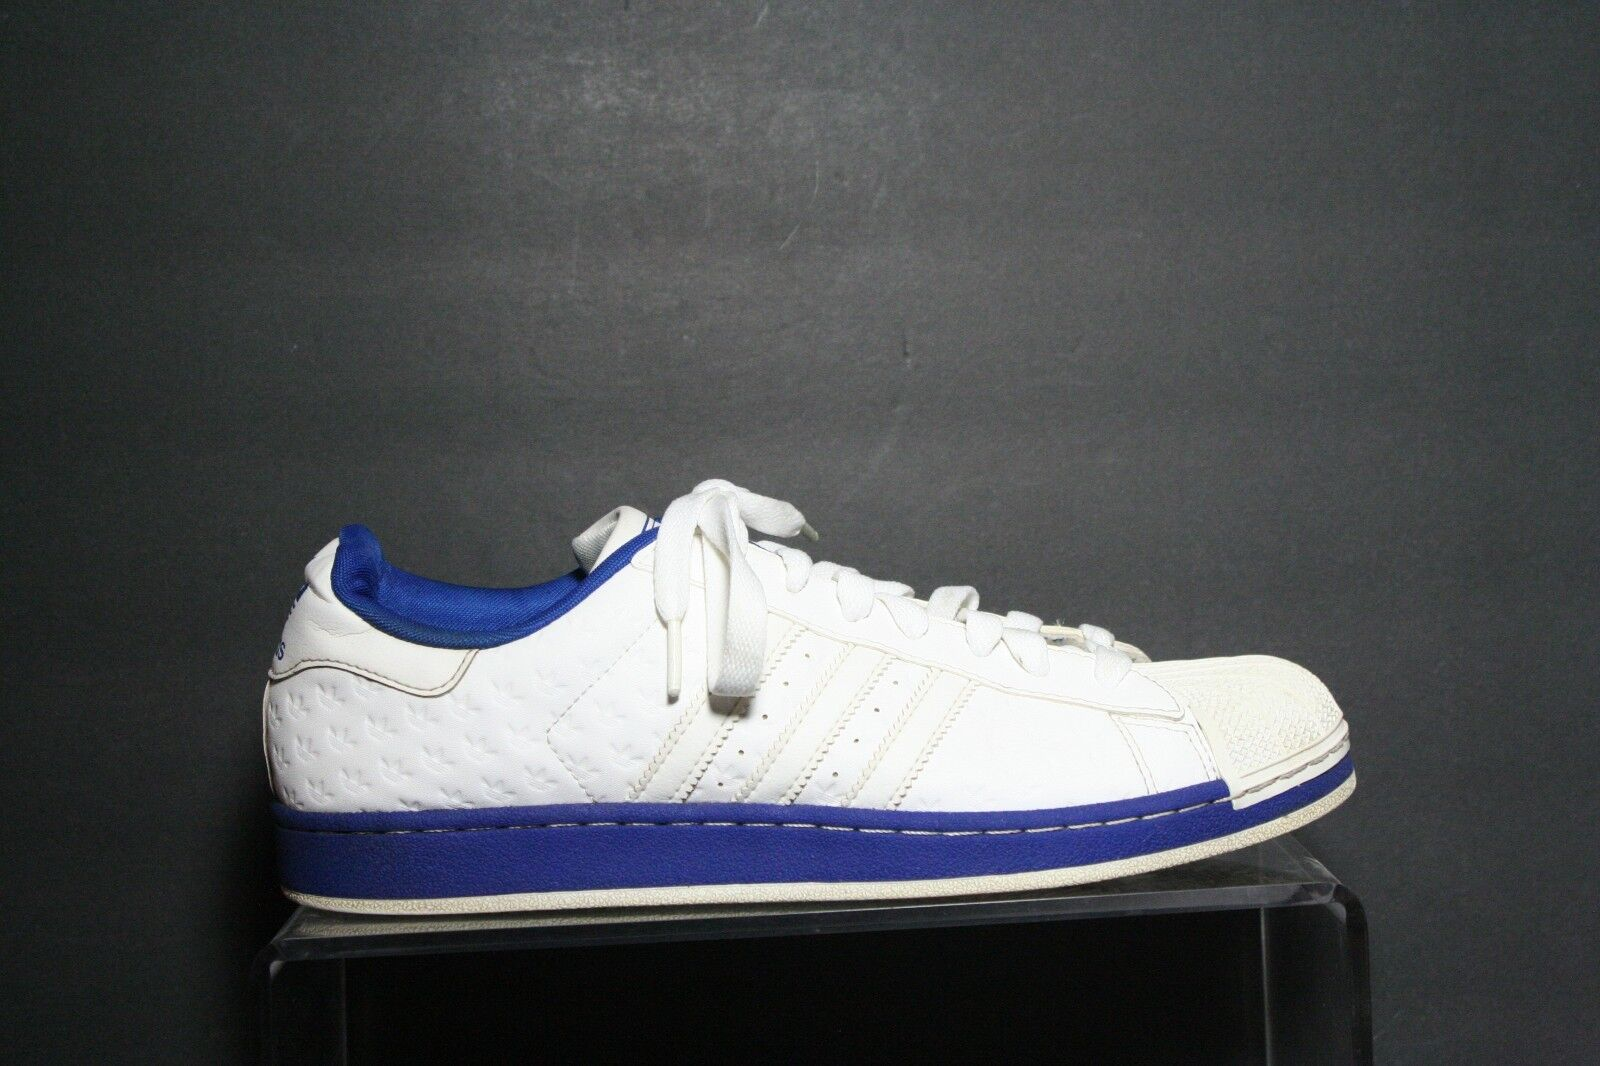 Adidas superstar 2 ripropone bianco og 2008 multi - bianco ripropone blu uomini 12 grande logo trifoglio athletic 54043b